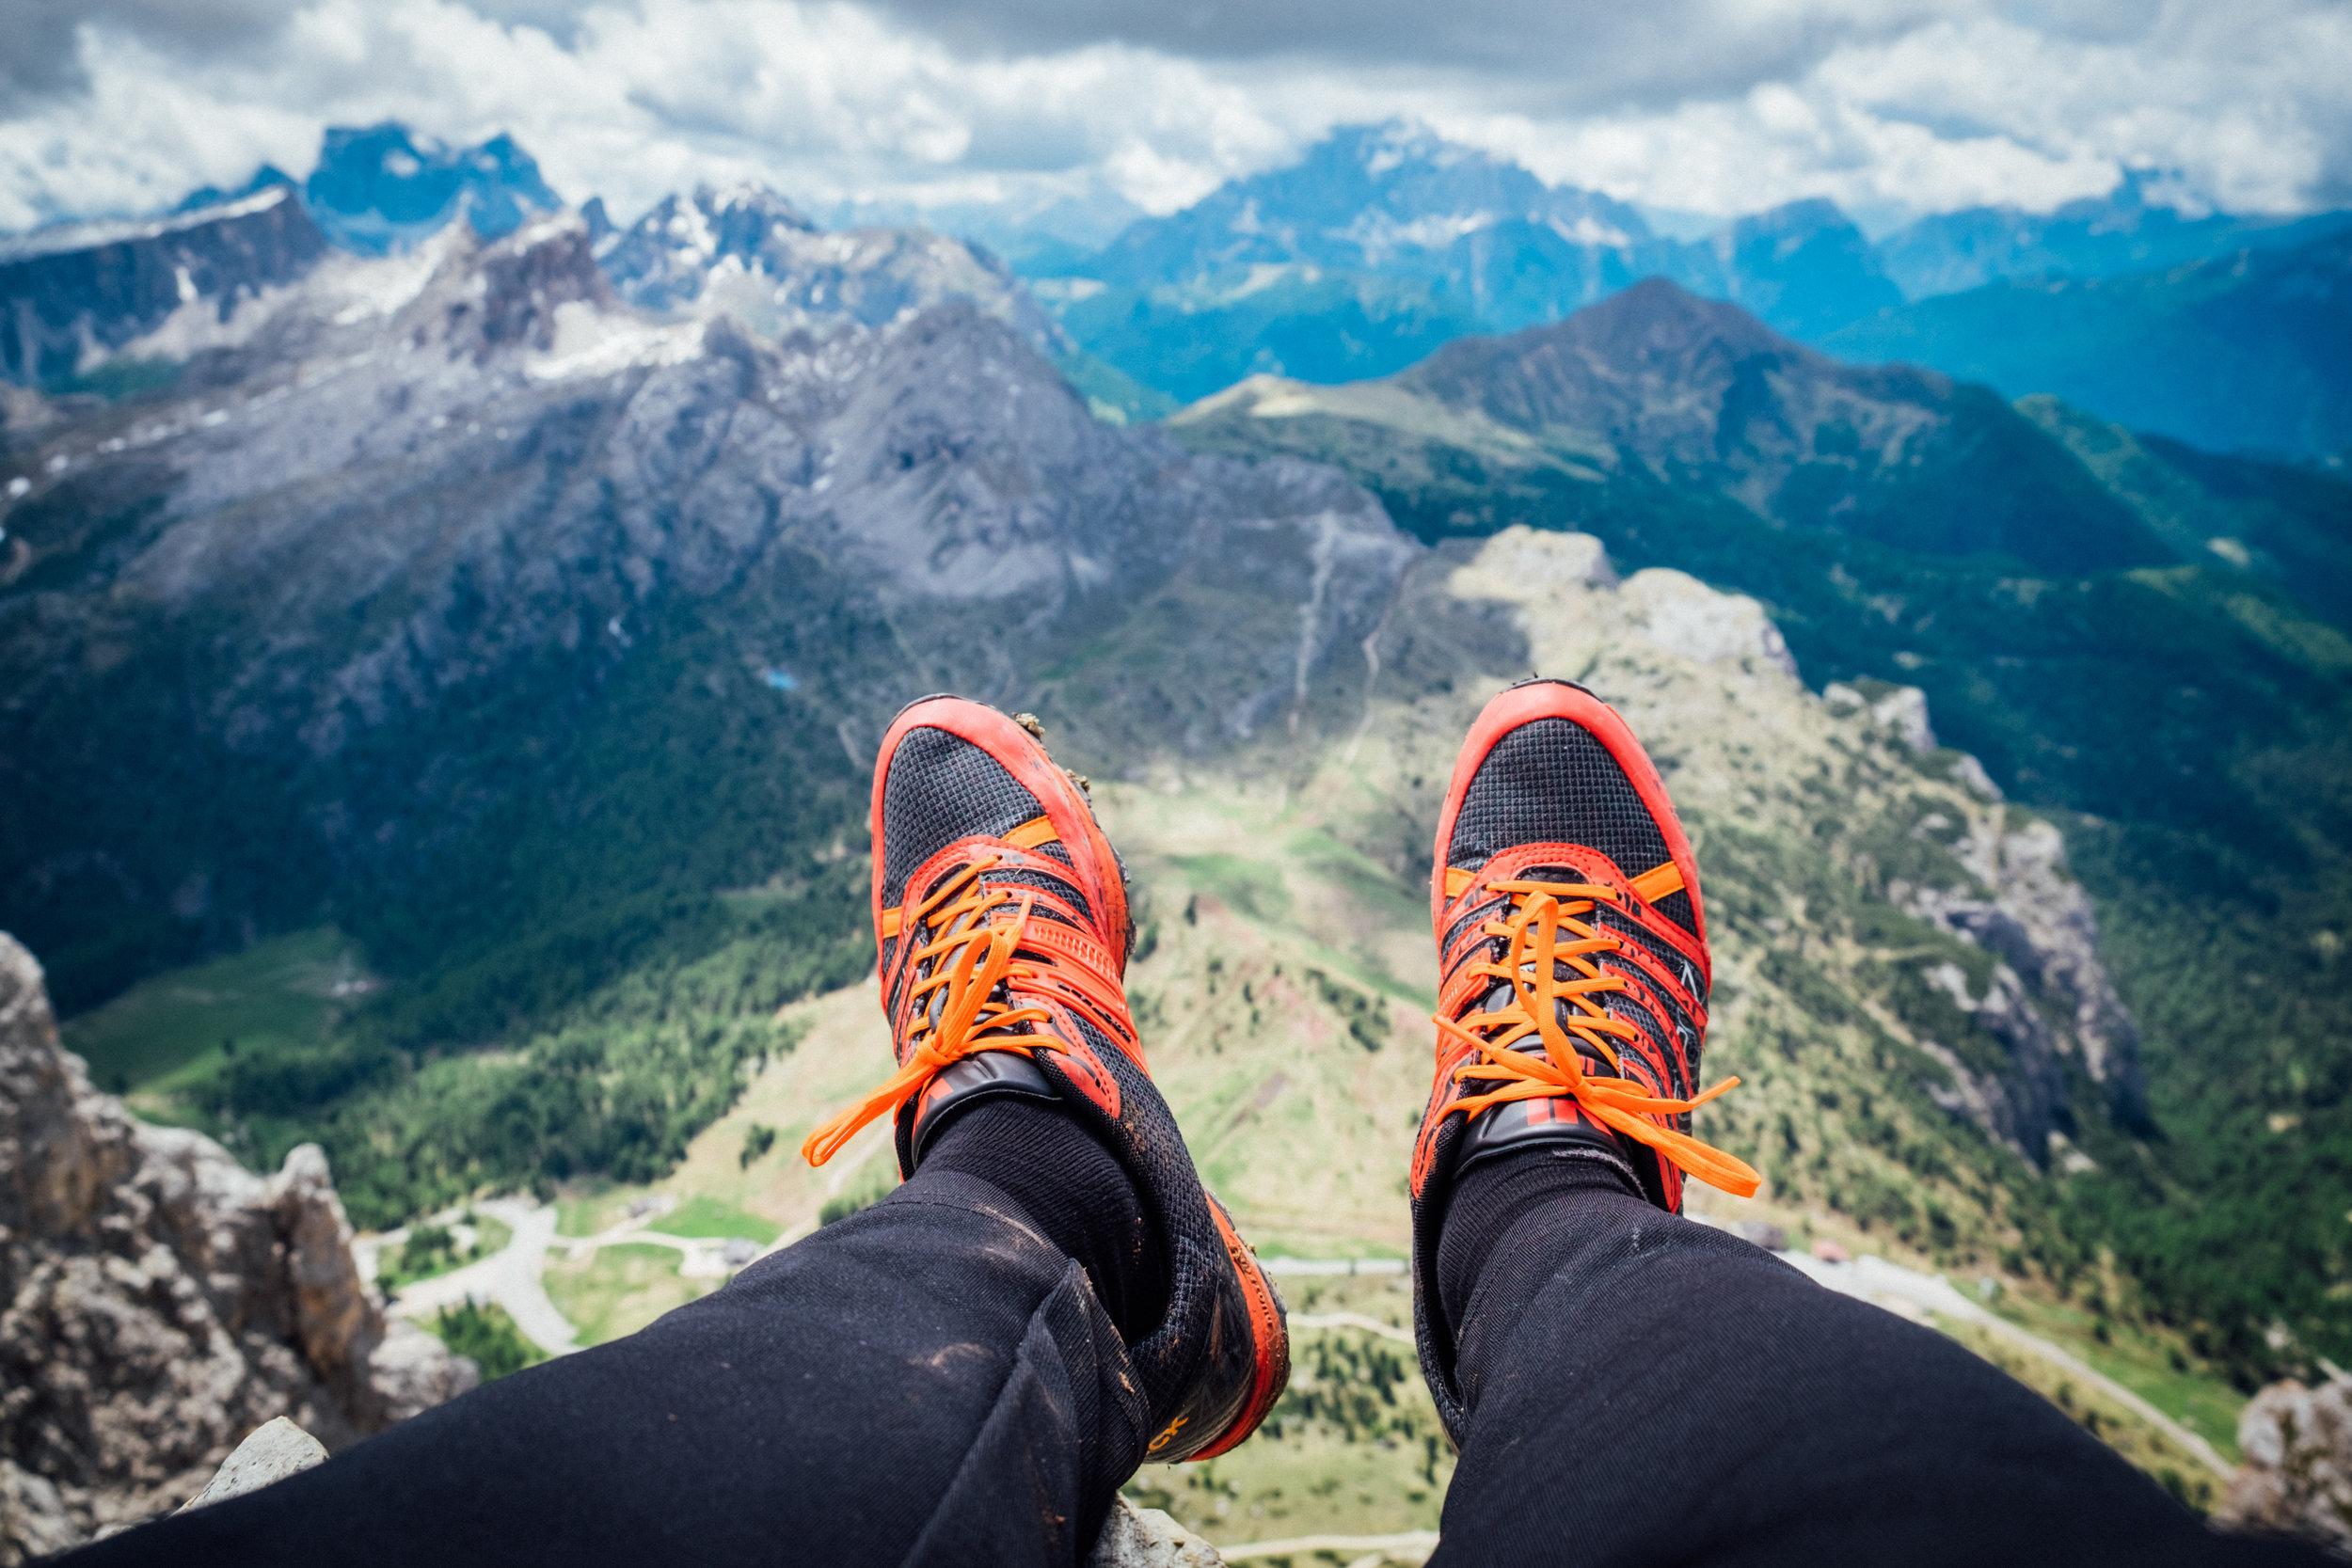 Irock 2 up in the Italian Dolomites